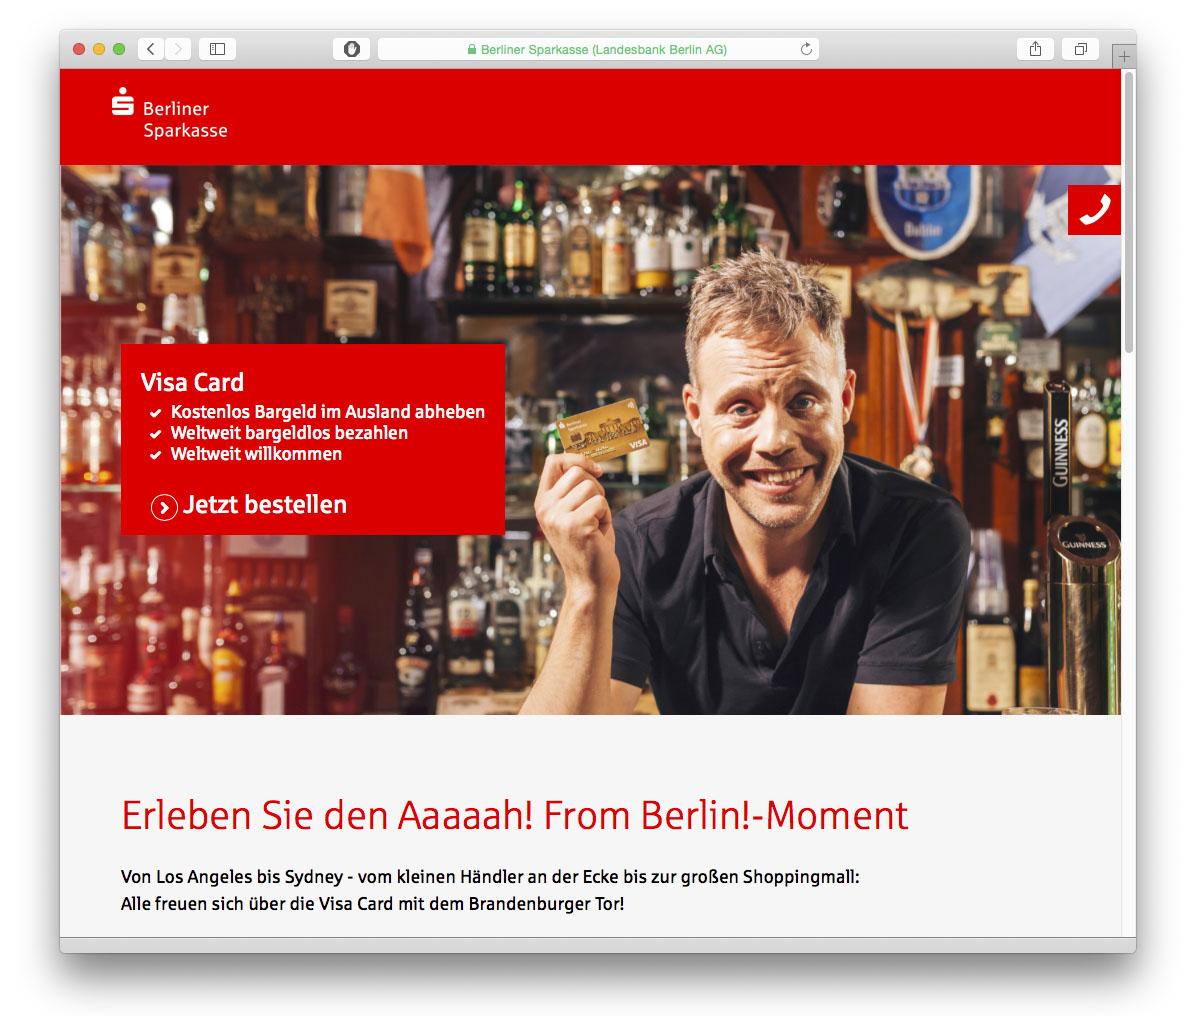 01_02_Berliner_Sparkasse_Visakarte_Jens_Quasten